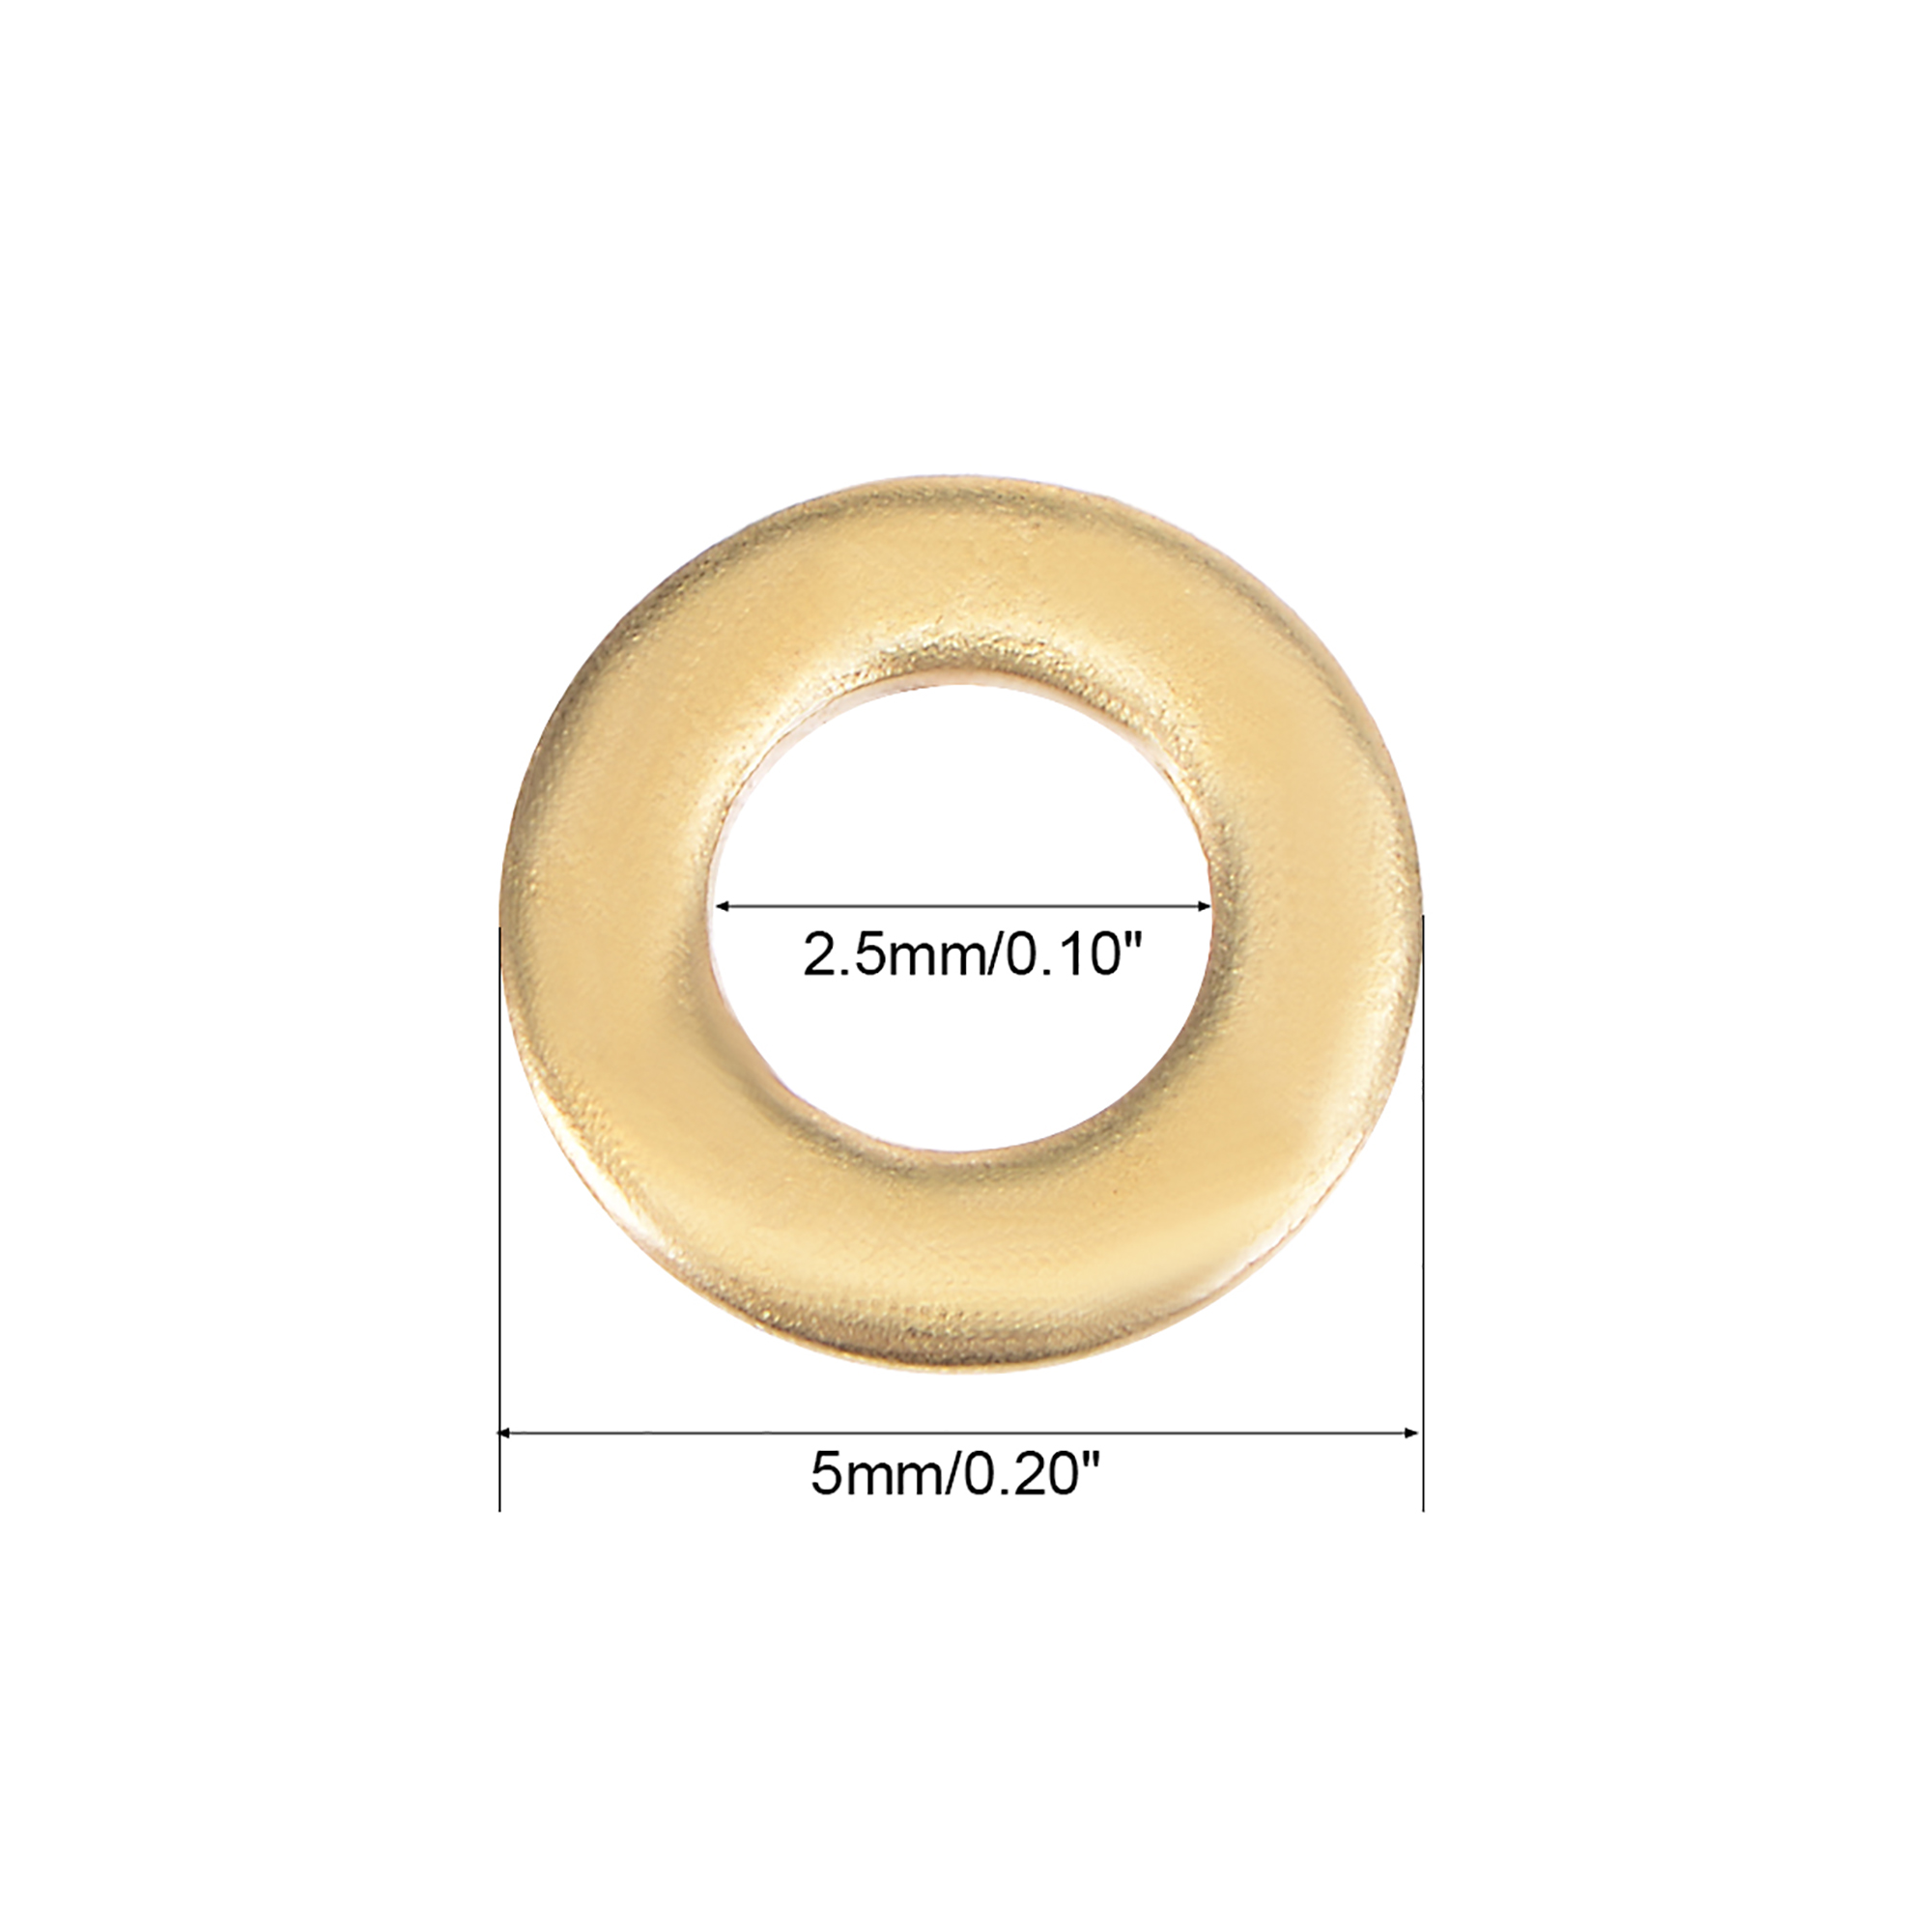 100Pcs 2.5mm x 5mm x 0.5mm Copper Flat Washer for Screw Bolt - image 2 de 3